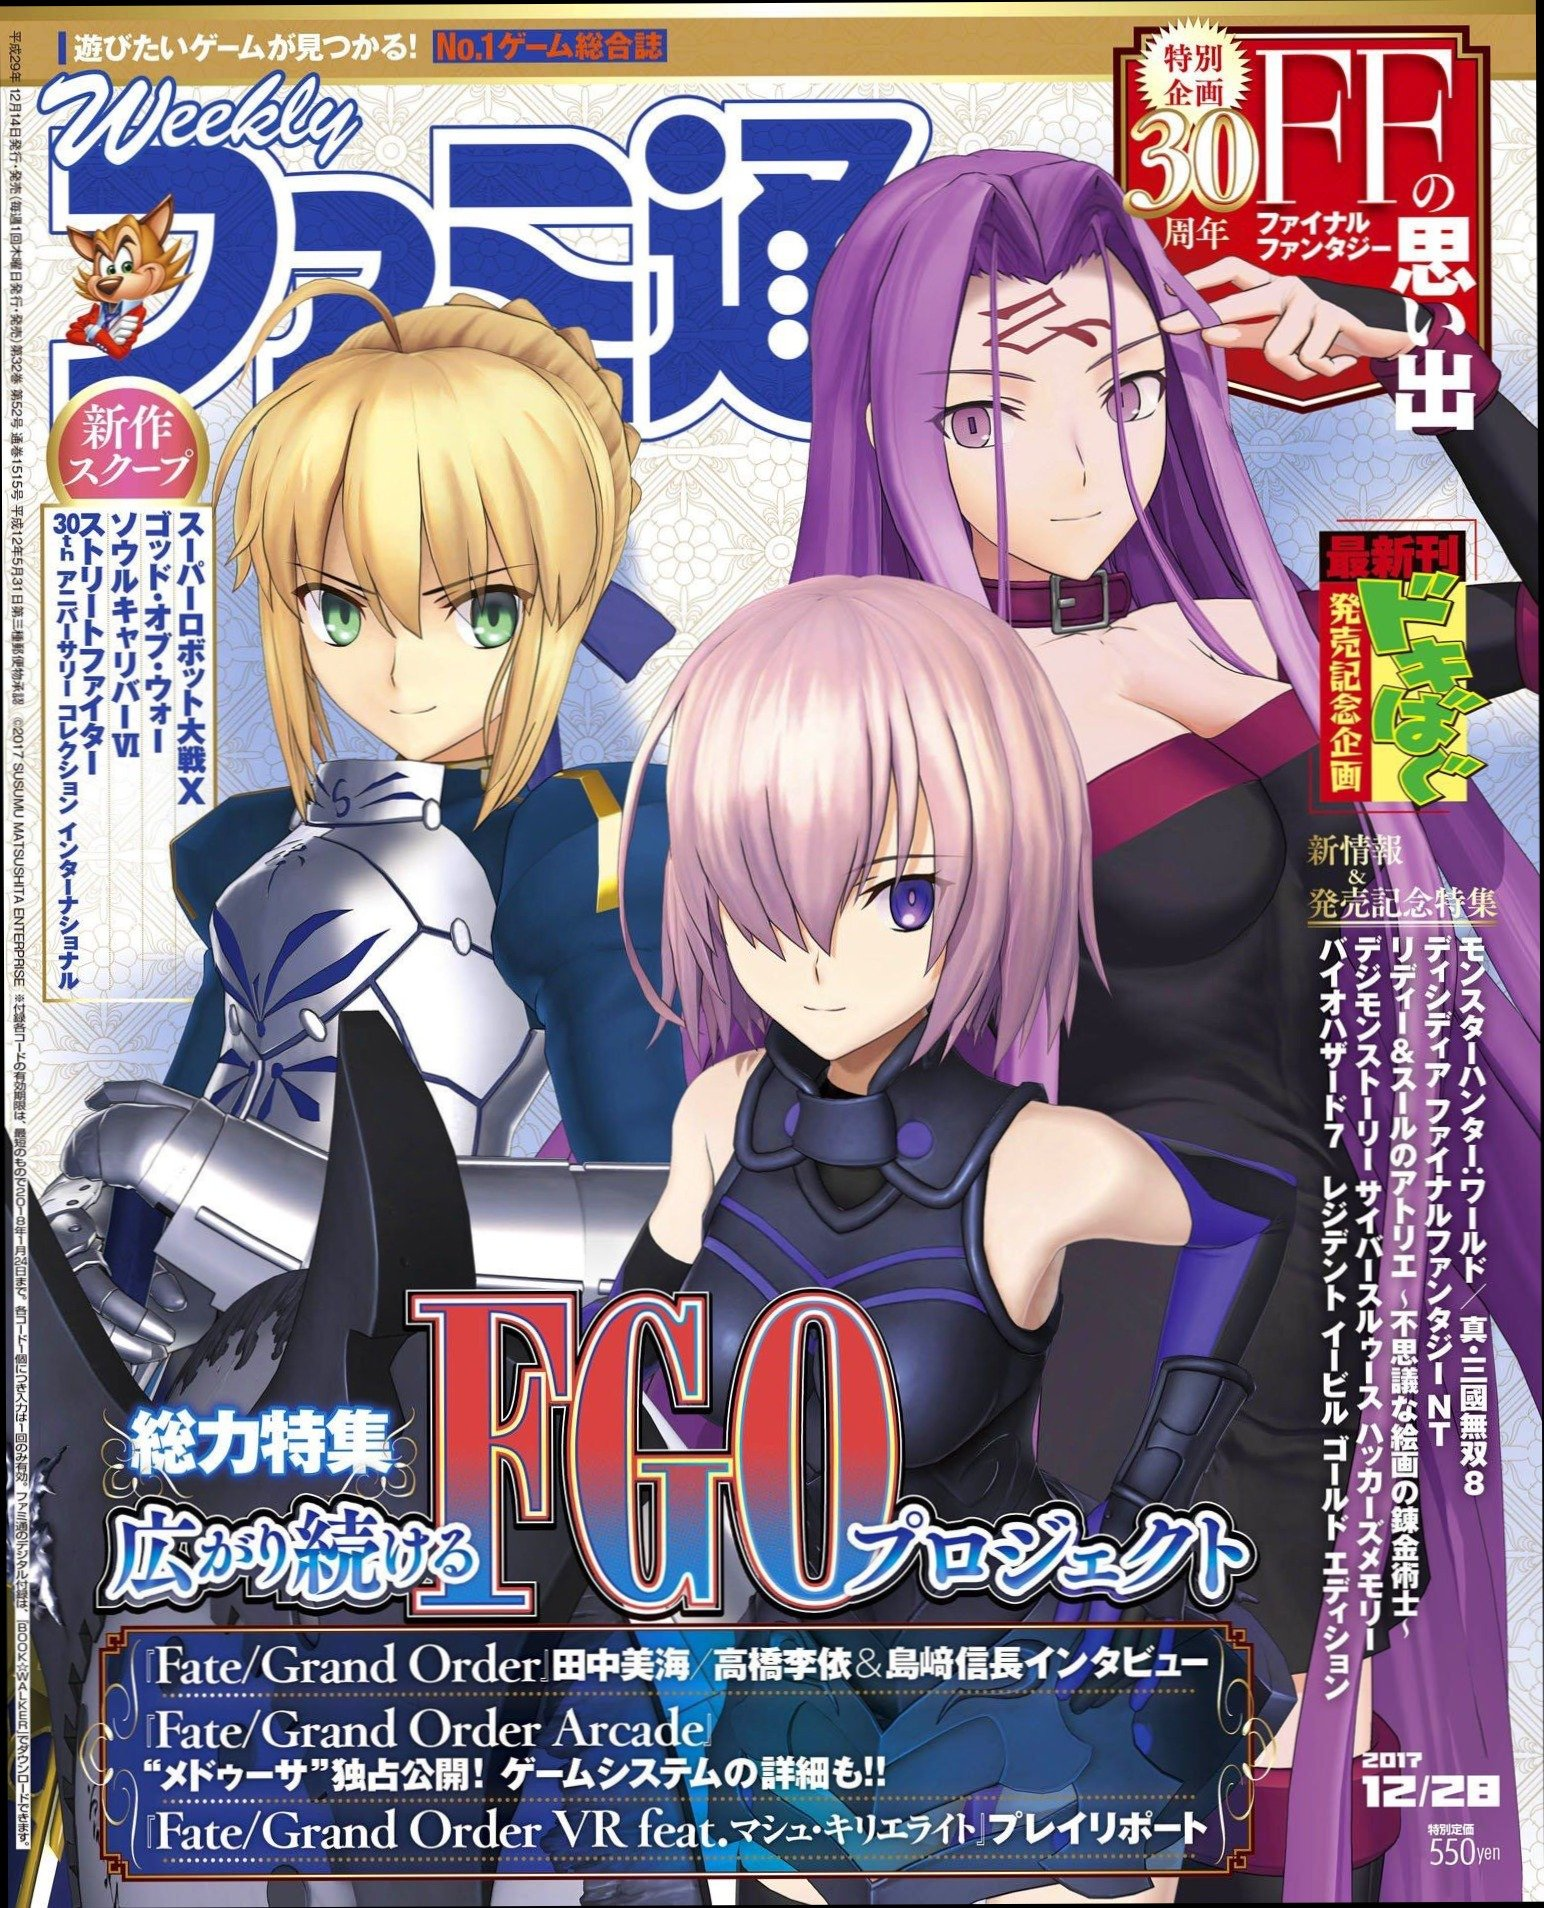 Famitsu 1515 (December 28, 2017)